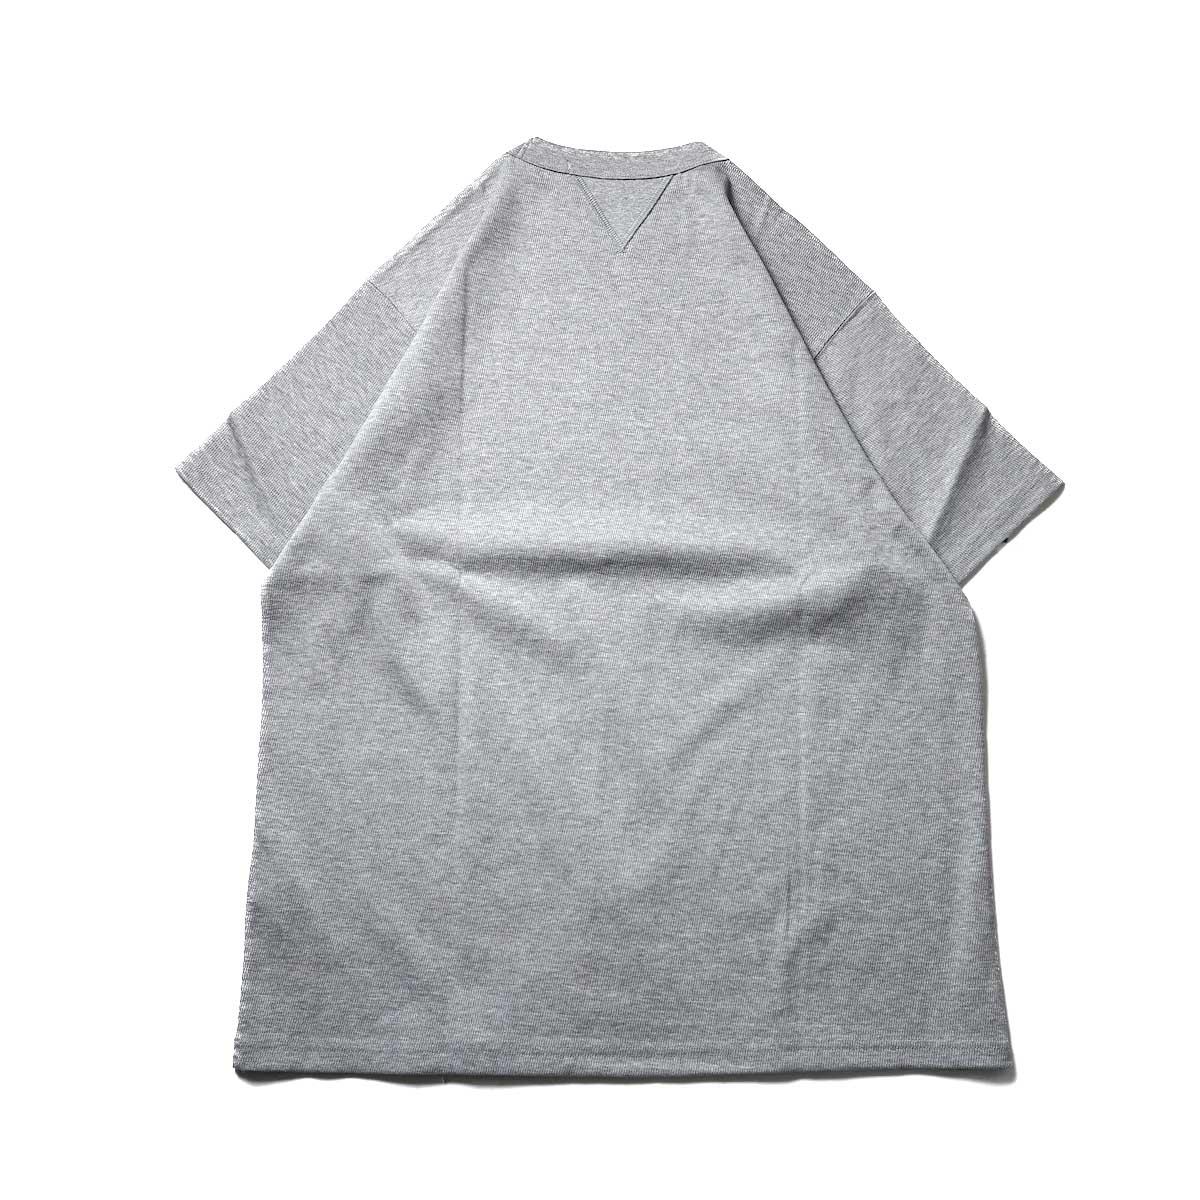 FUTURE PRIMITIVE / FP THERMAL V T-SHIRT (Gray)背面